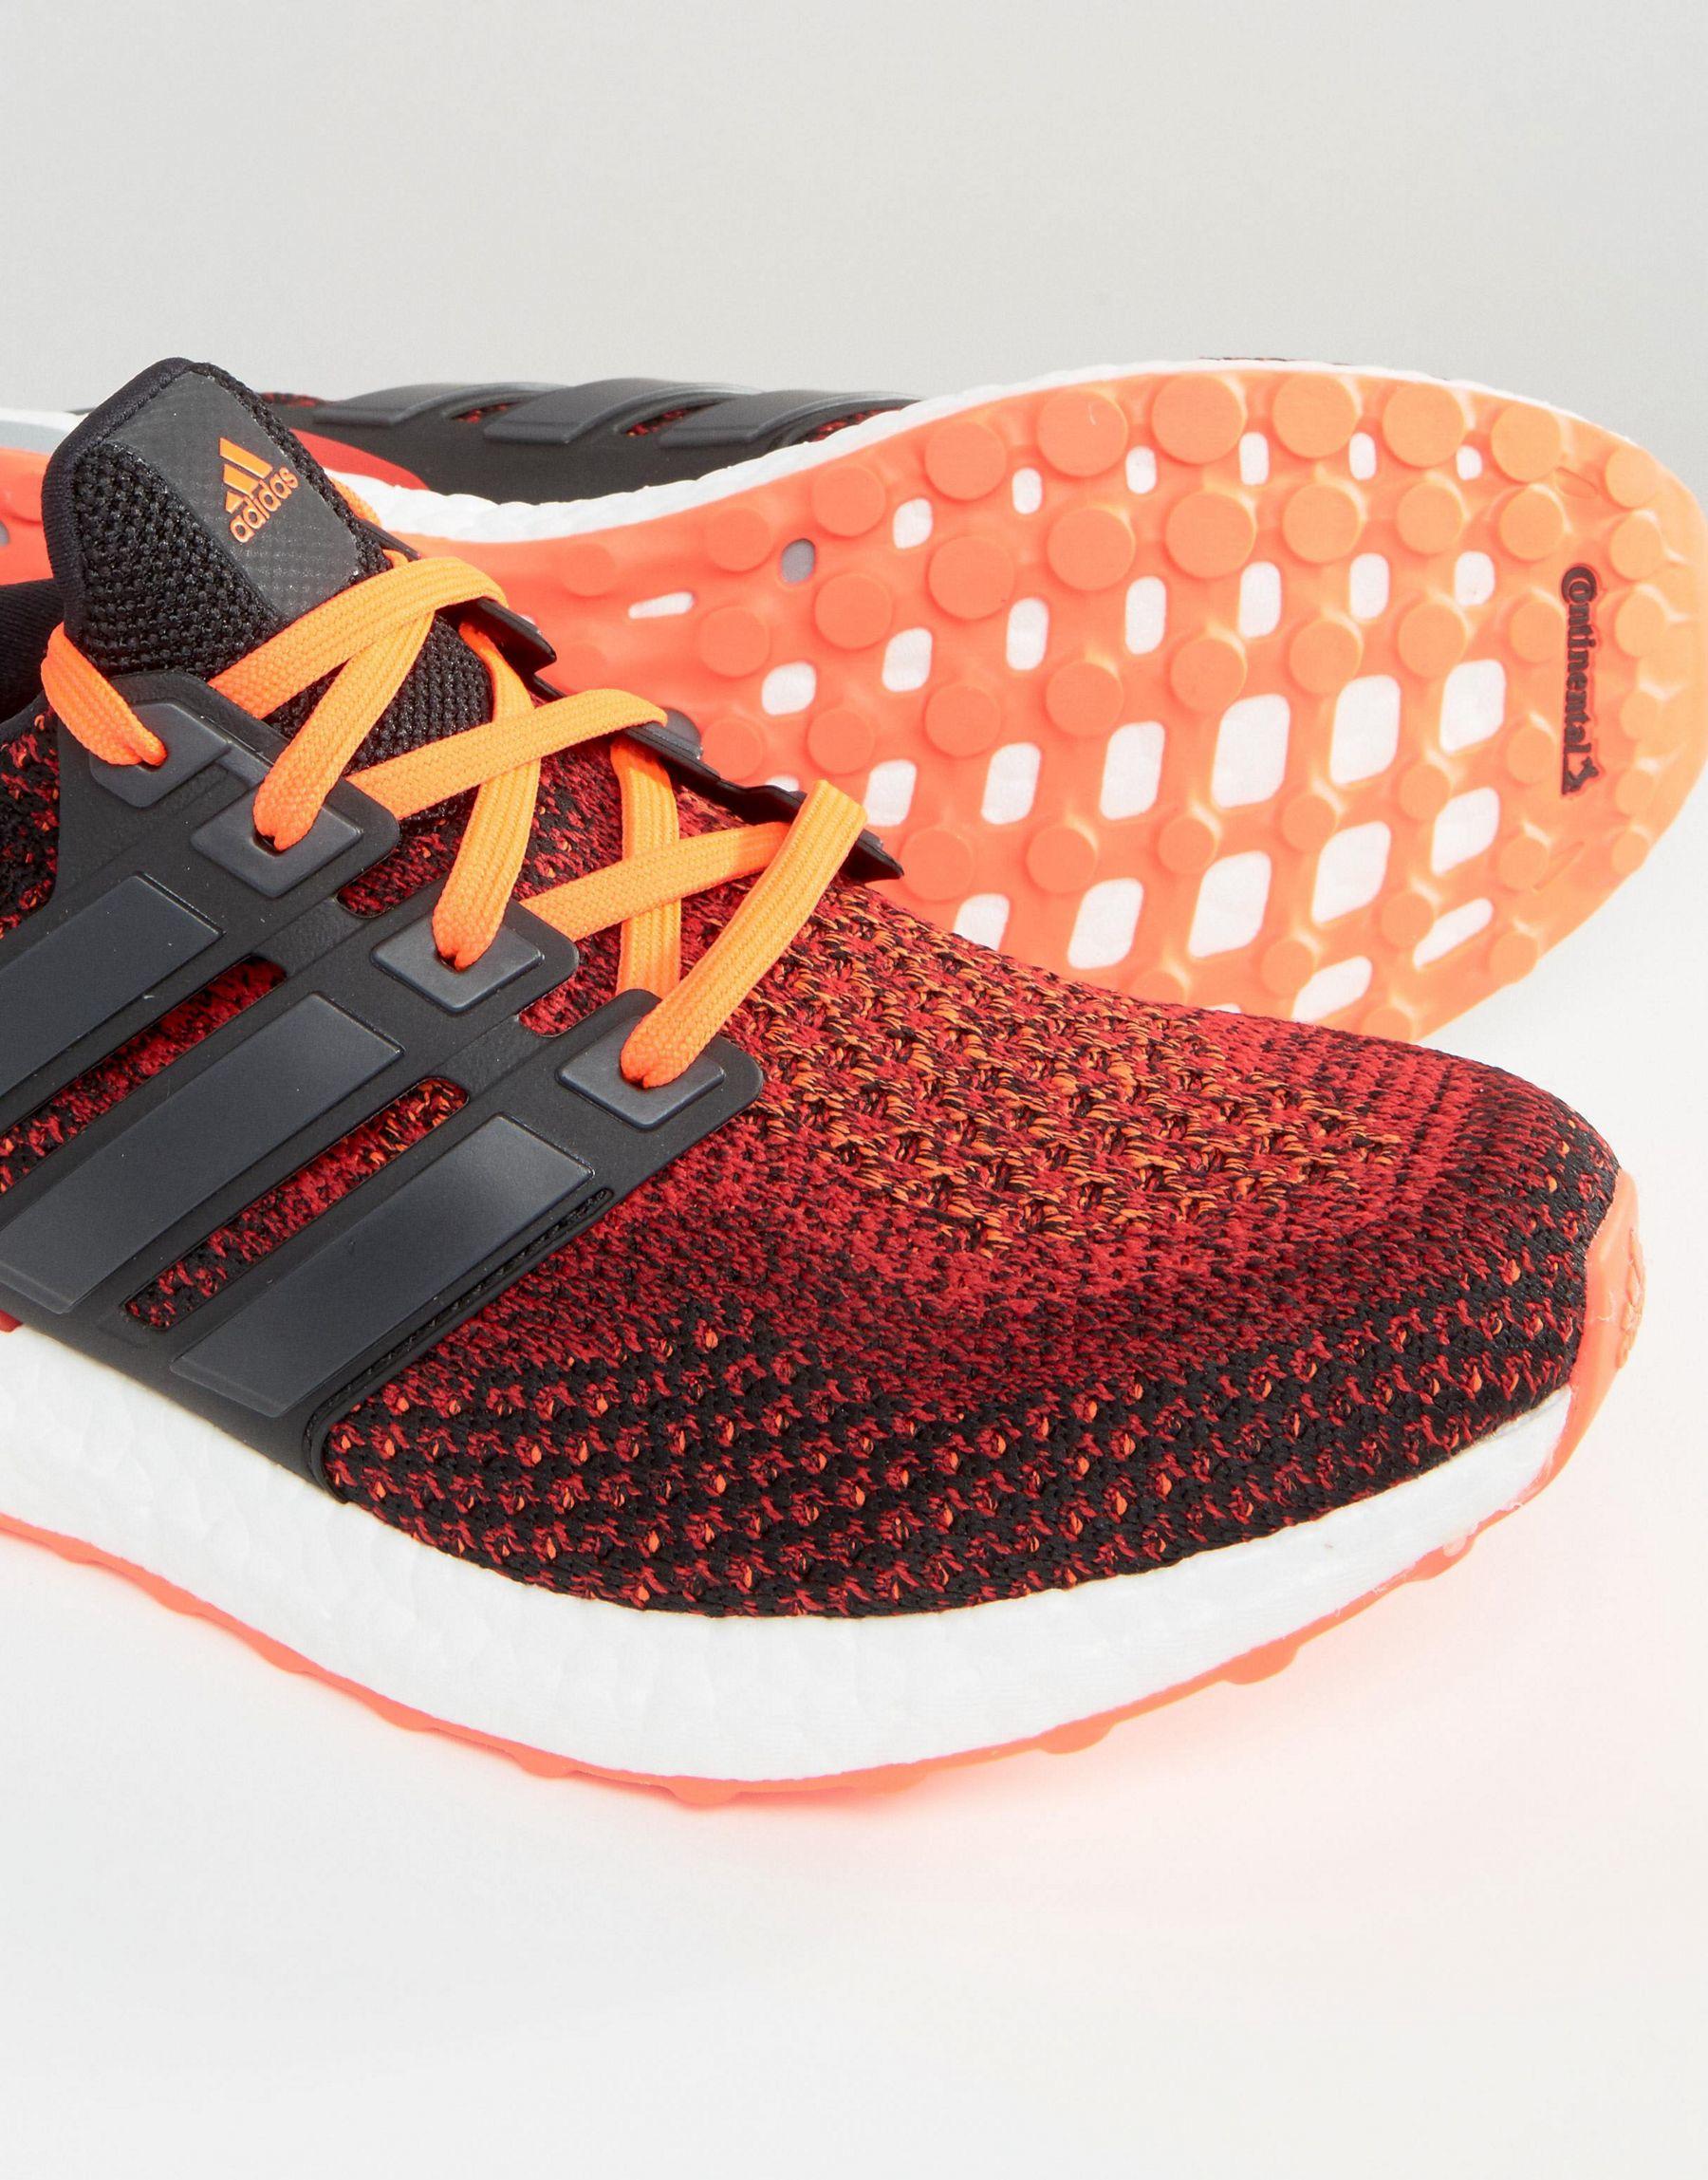 adidas originals ultra boost trainers in red aq5930